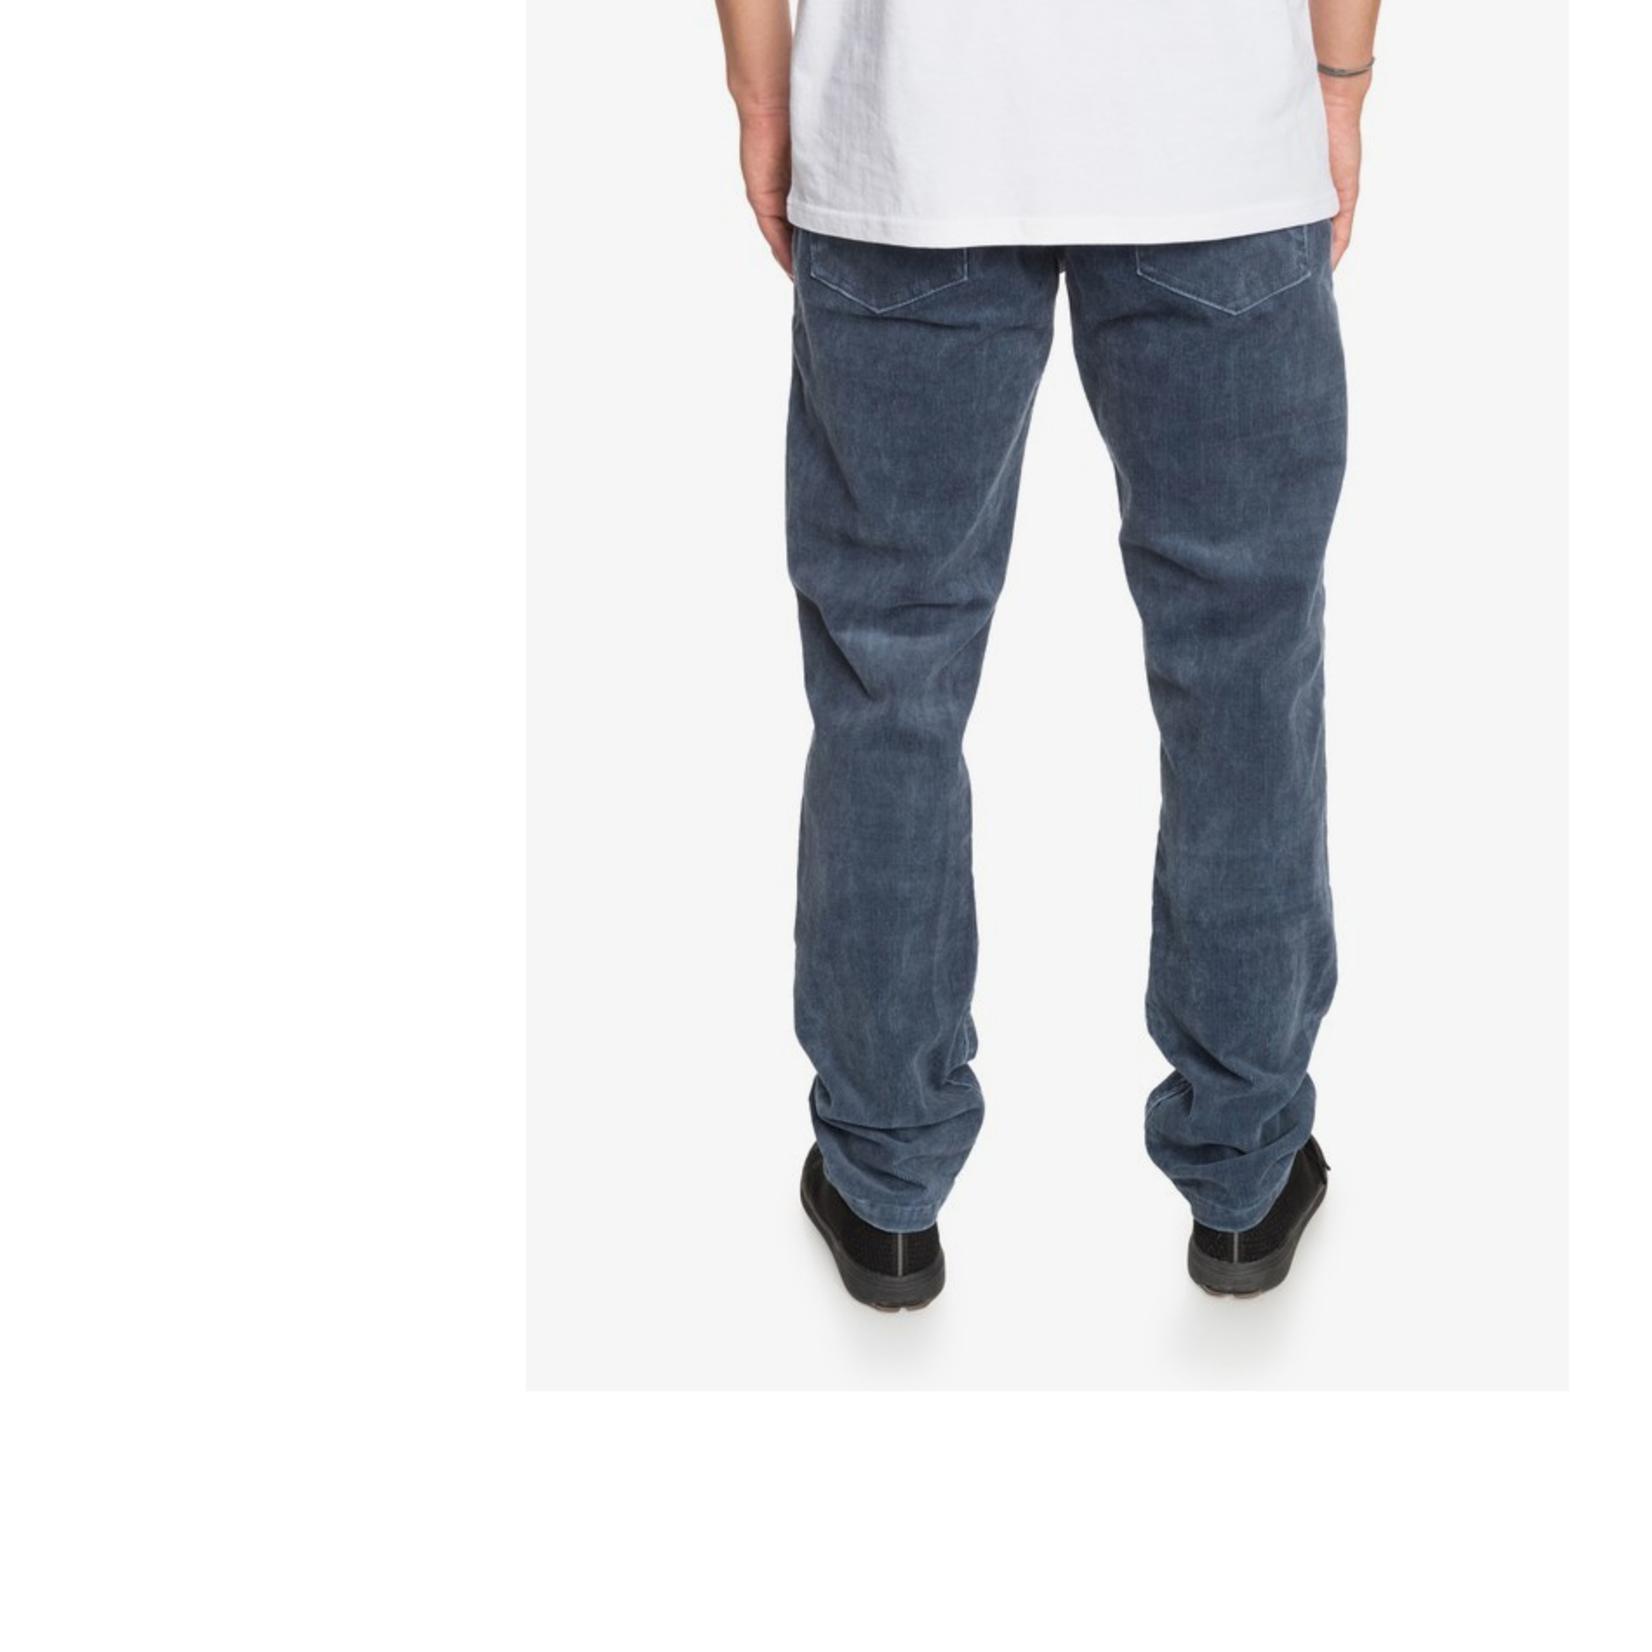 Quiksilver Quiksilver Kracker Cord Pants